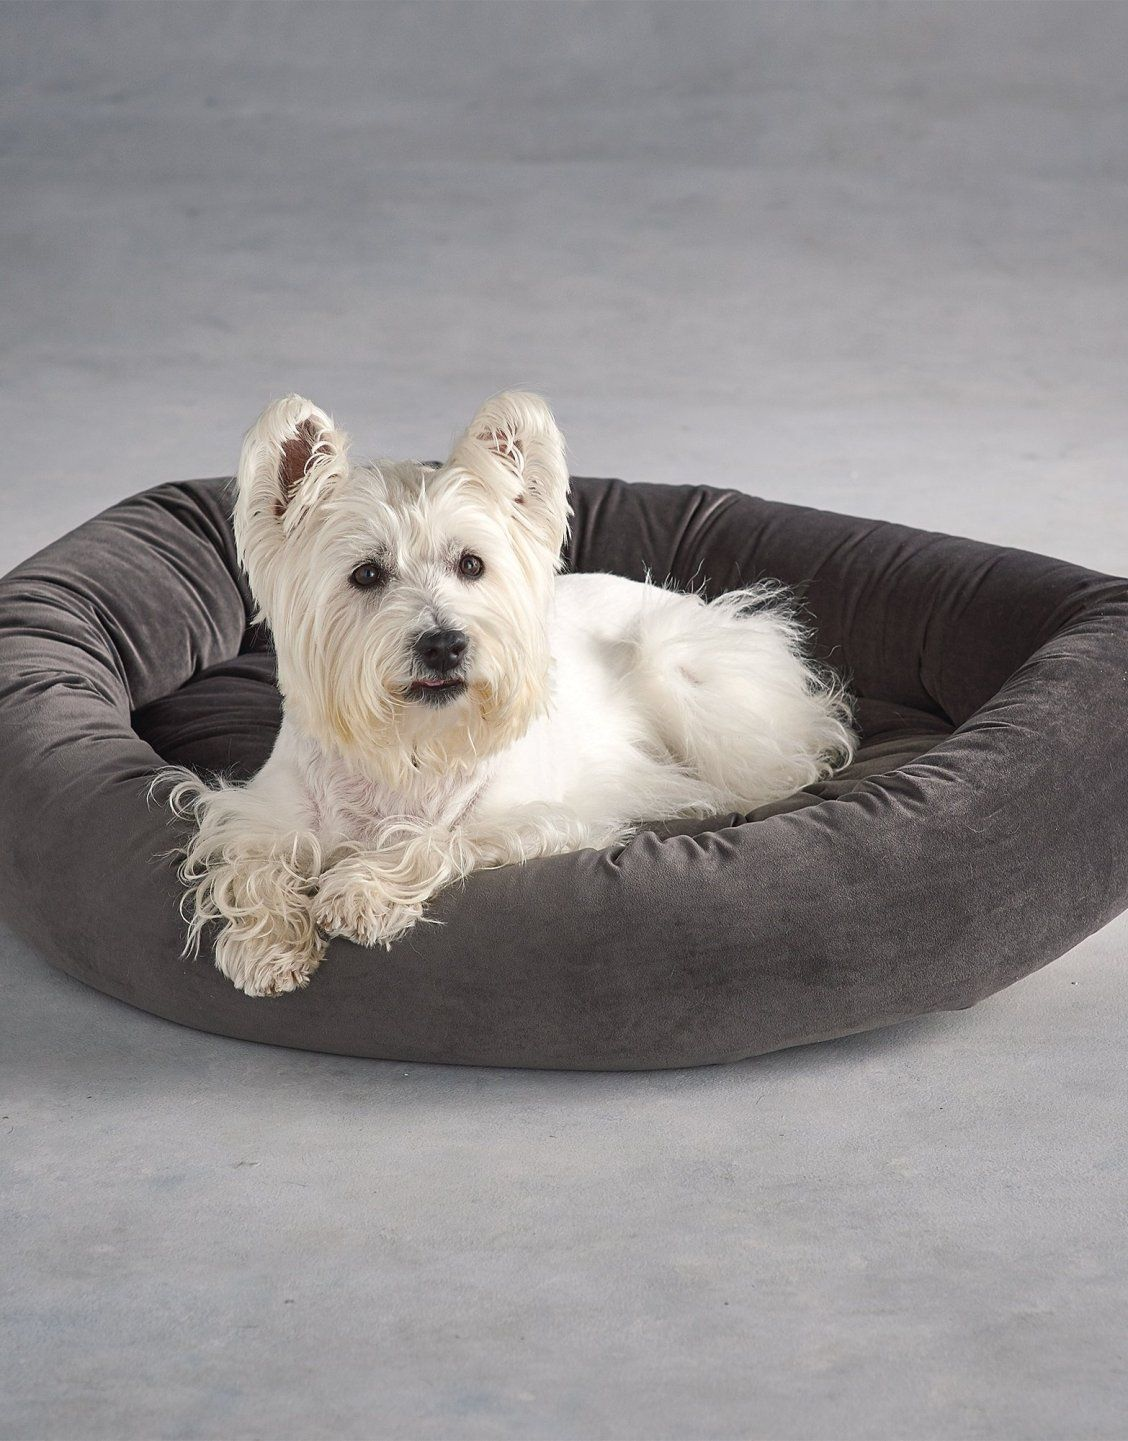 Ashton Donut Super Loft Fiber Pet Bed Pets, Your dog